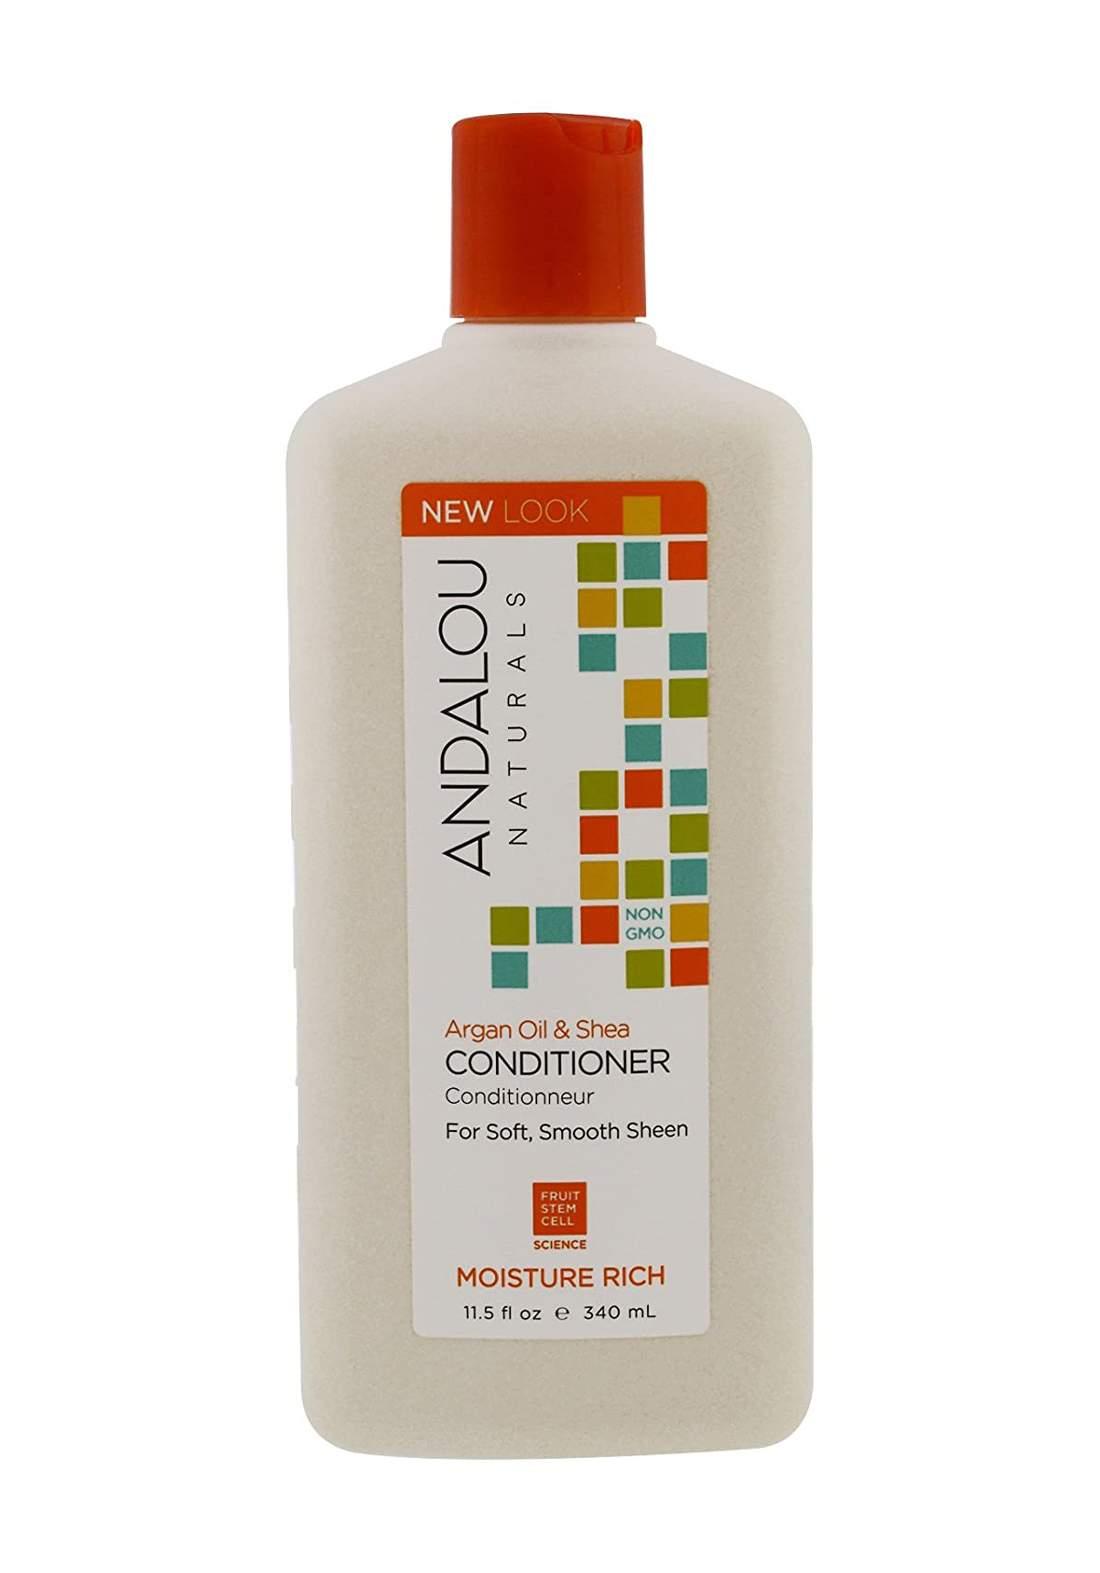 27102 Andalou Naturals Argan Oil AndShea Moisture Rich Conditioner 340ml  بلسم للشعر